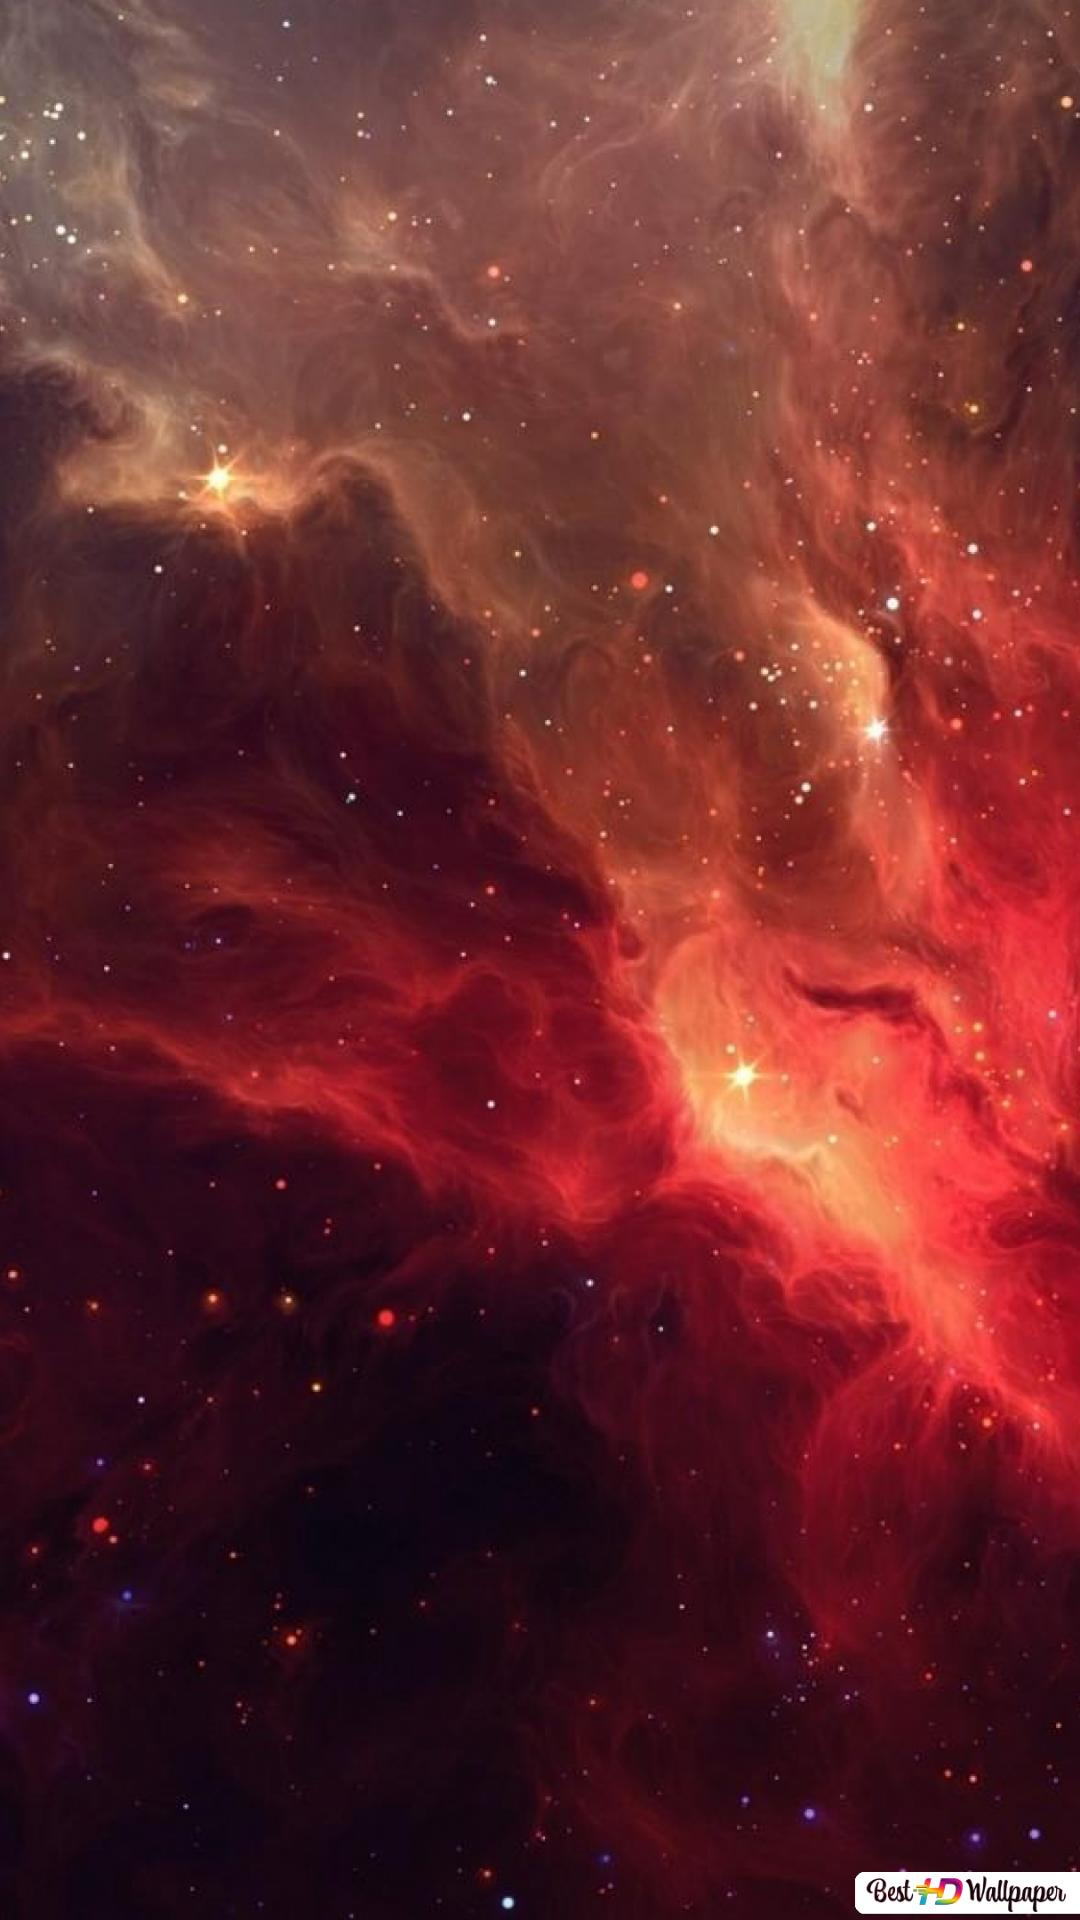 Fabelhaft Galaxy beyong der Milkyway HD Hintergrundbilder herunterladen @IR_77